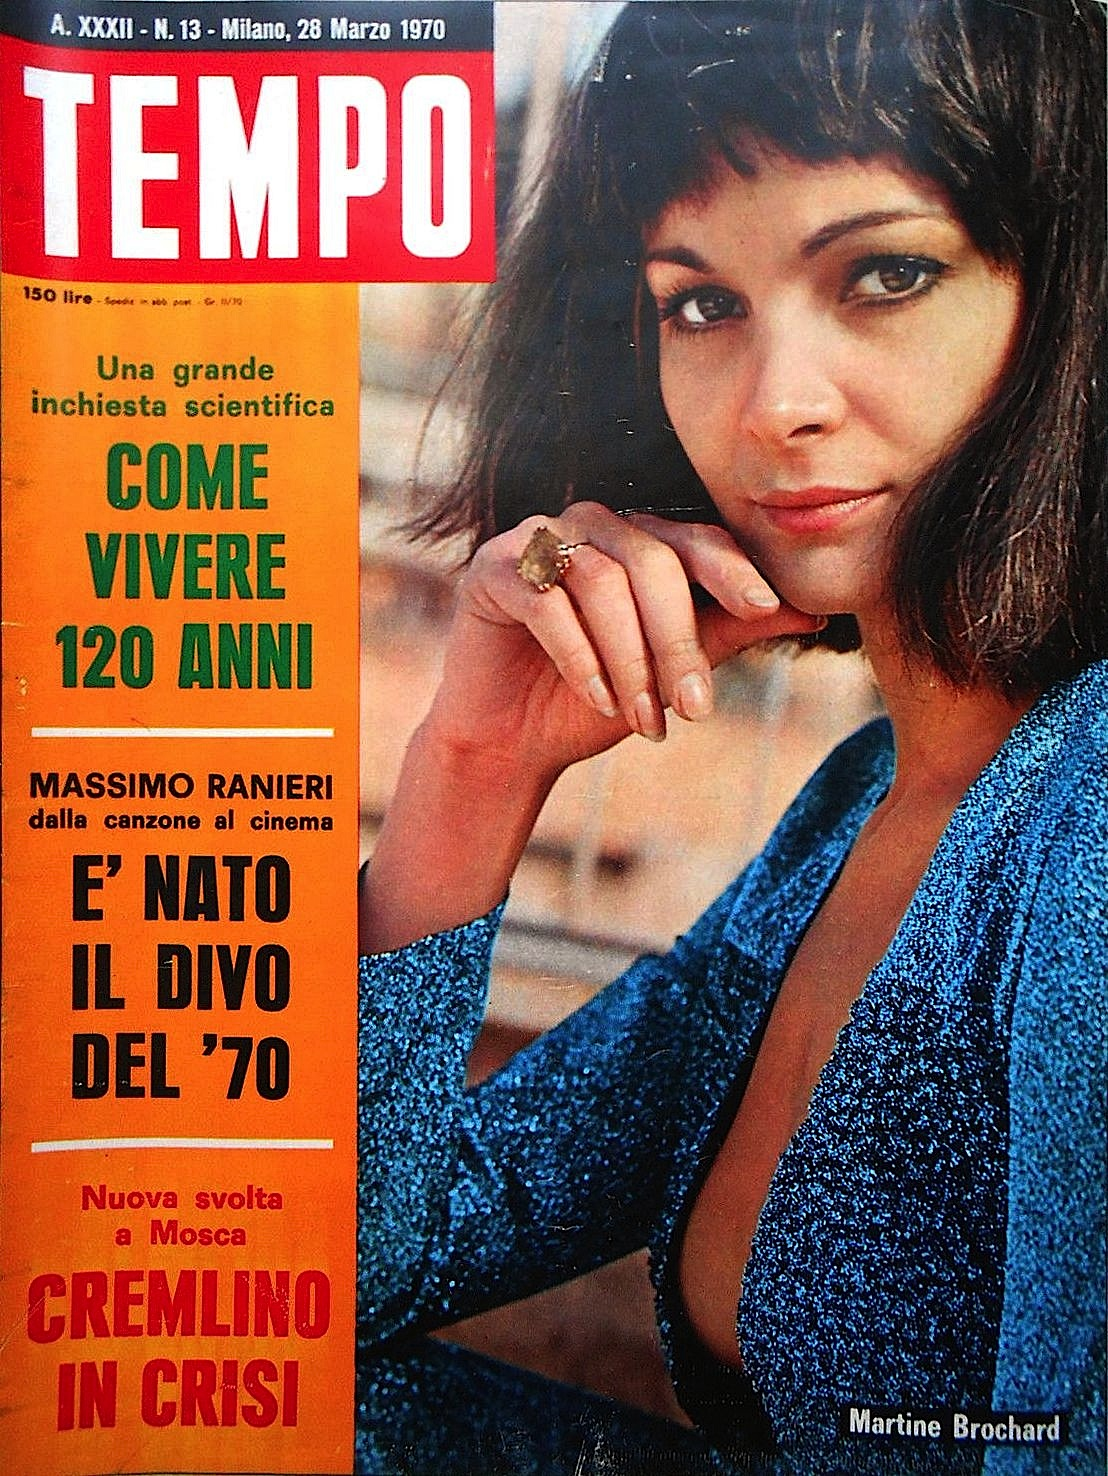 Martine_Brochard_coperrtina_il_tempo_1970